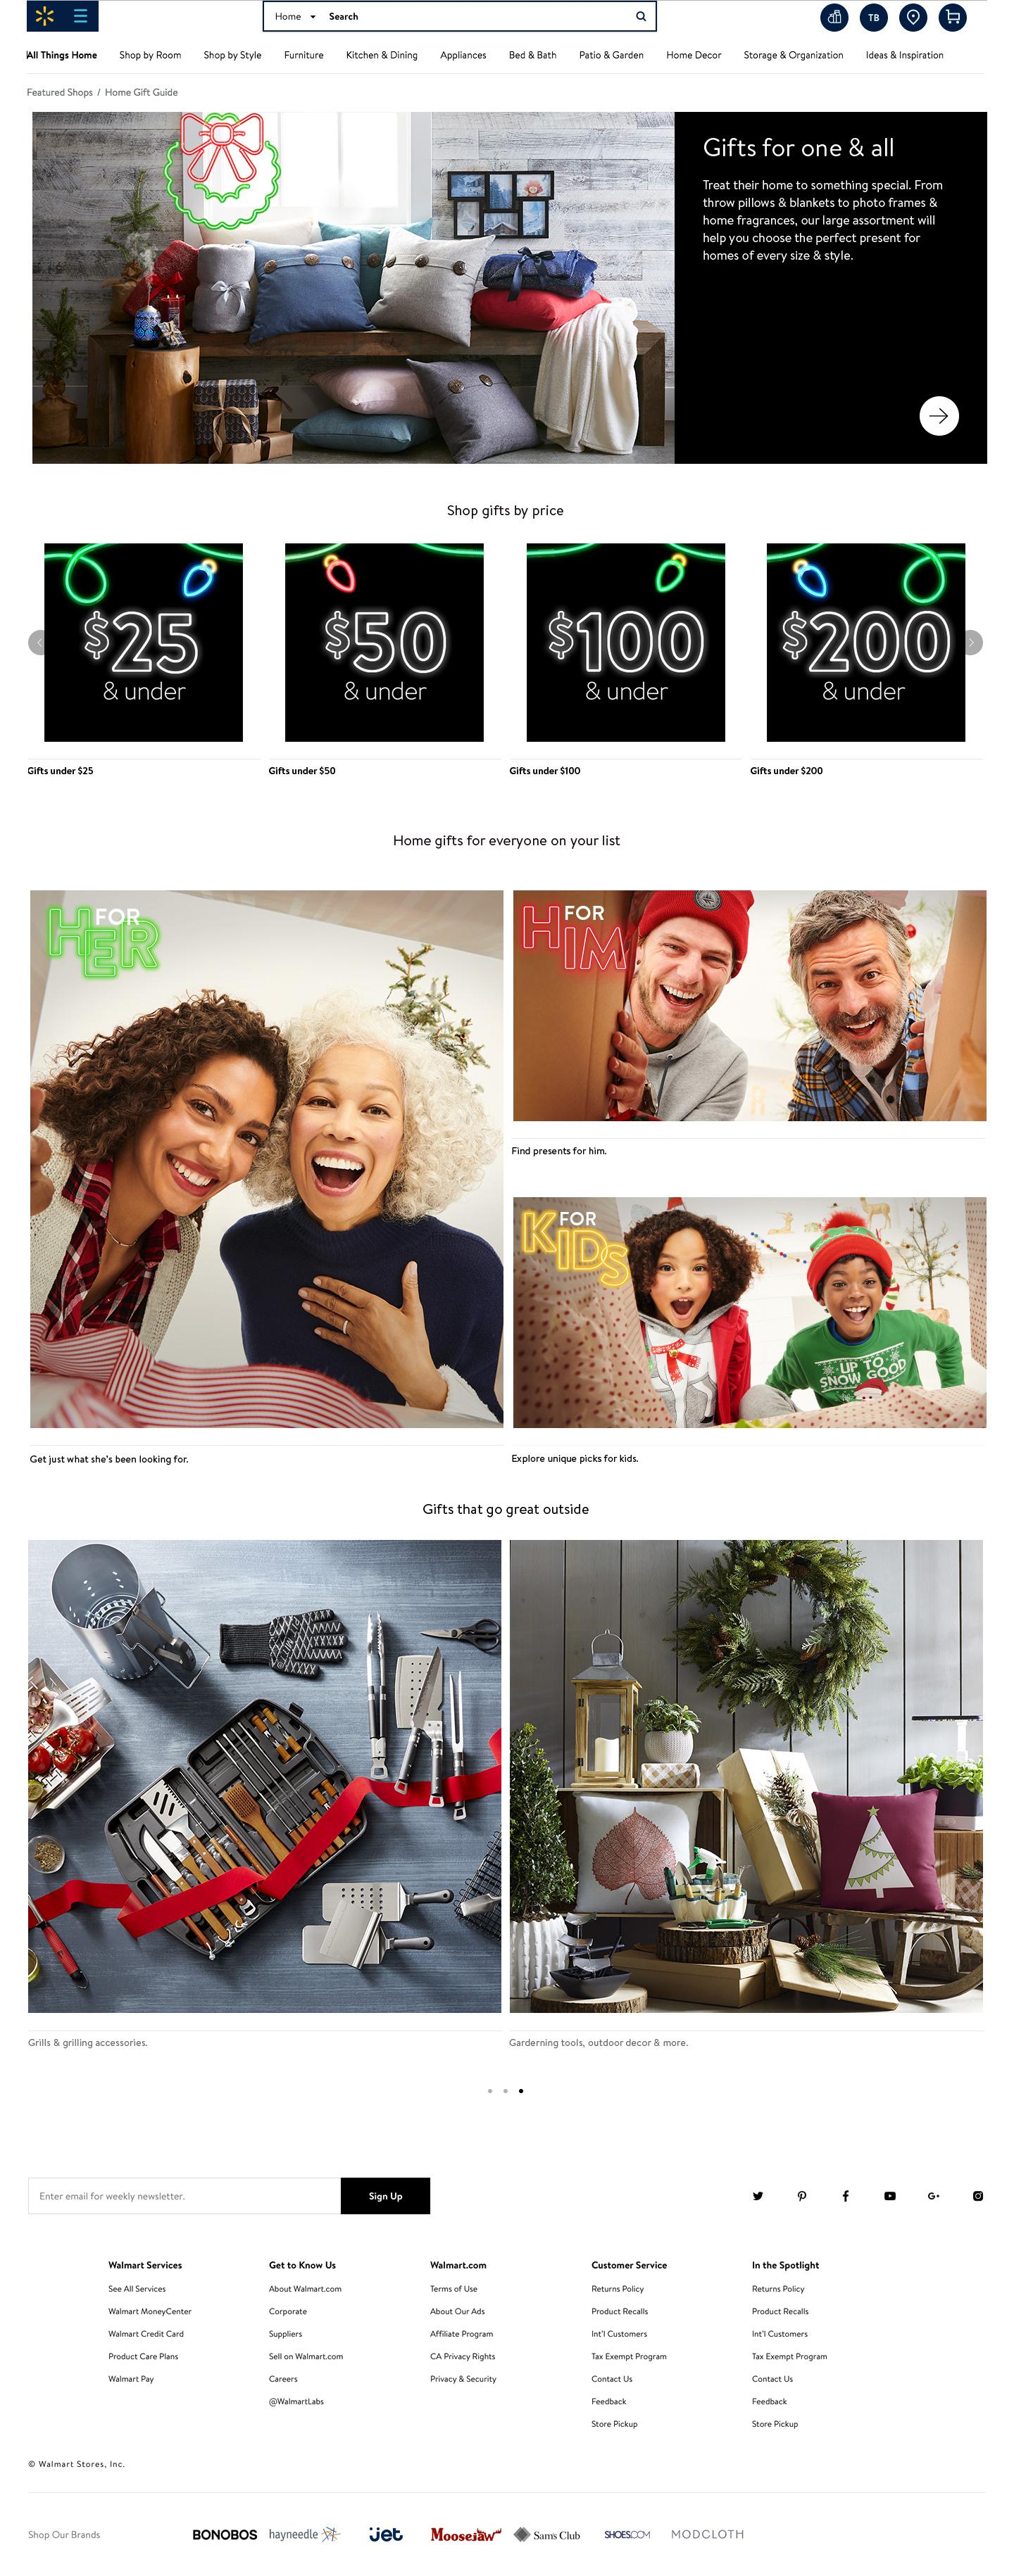 43945-262860_Home_Holiday_Gift_Guide_Mockup.jpg